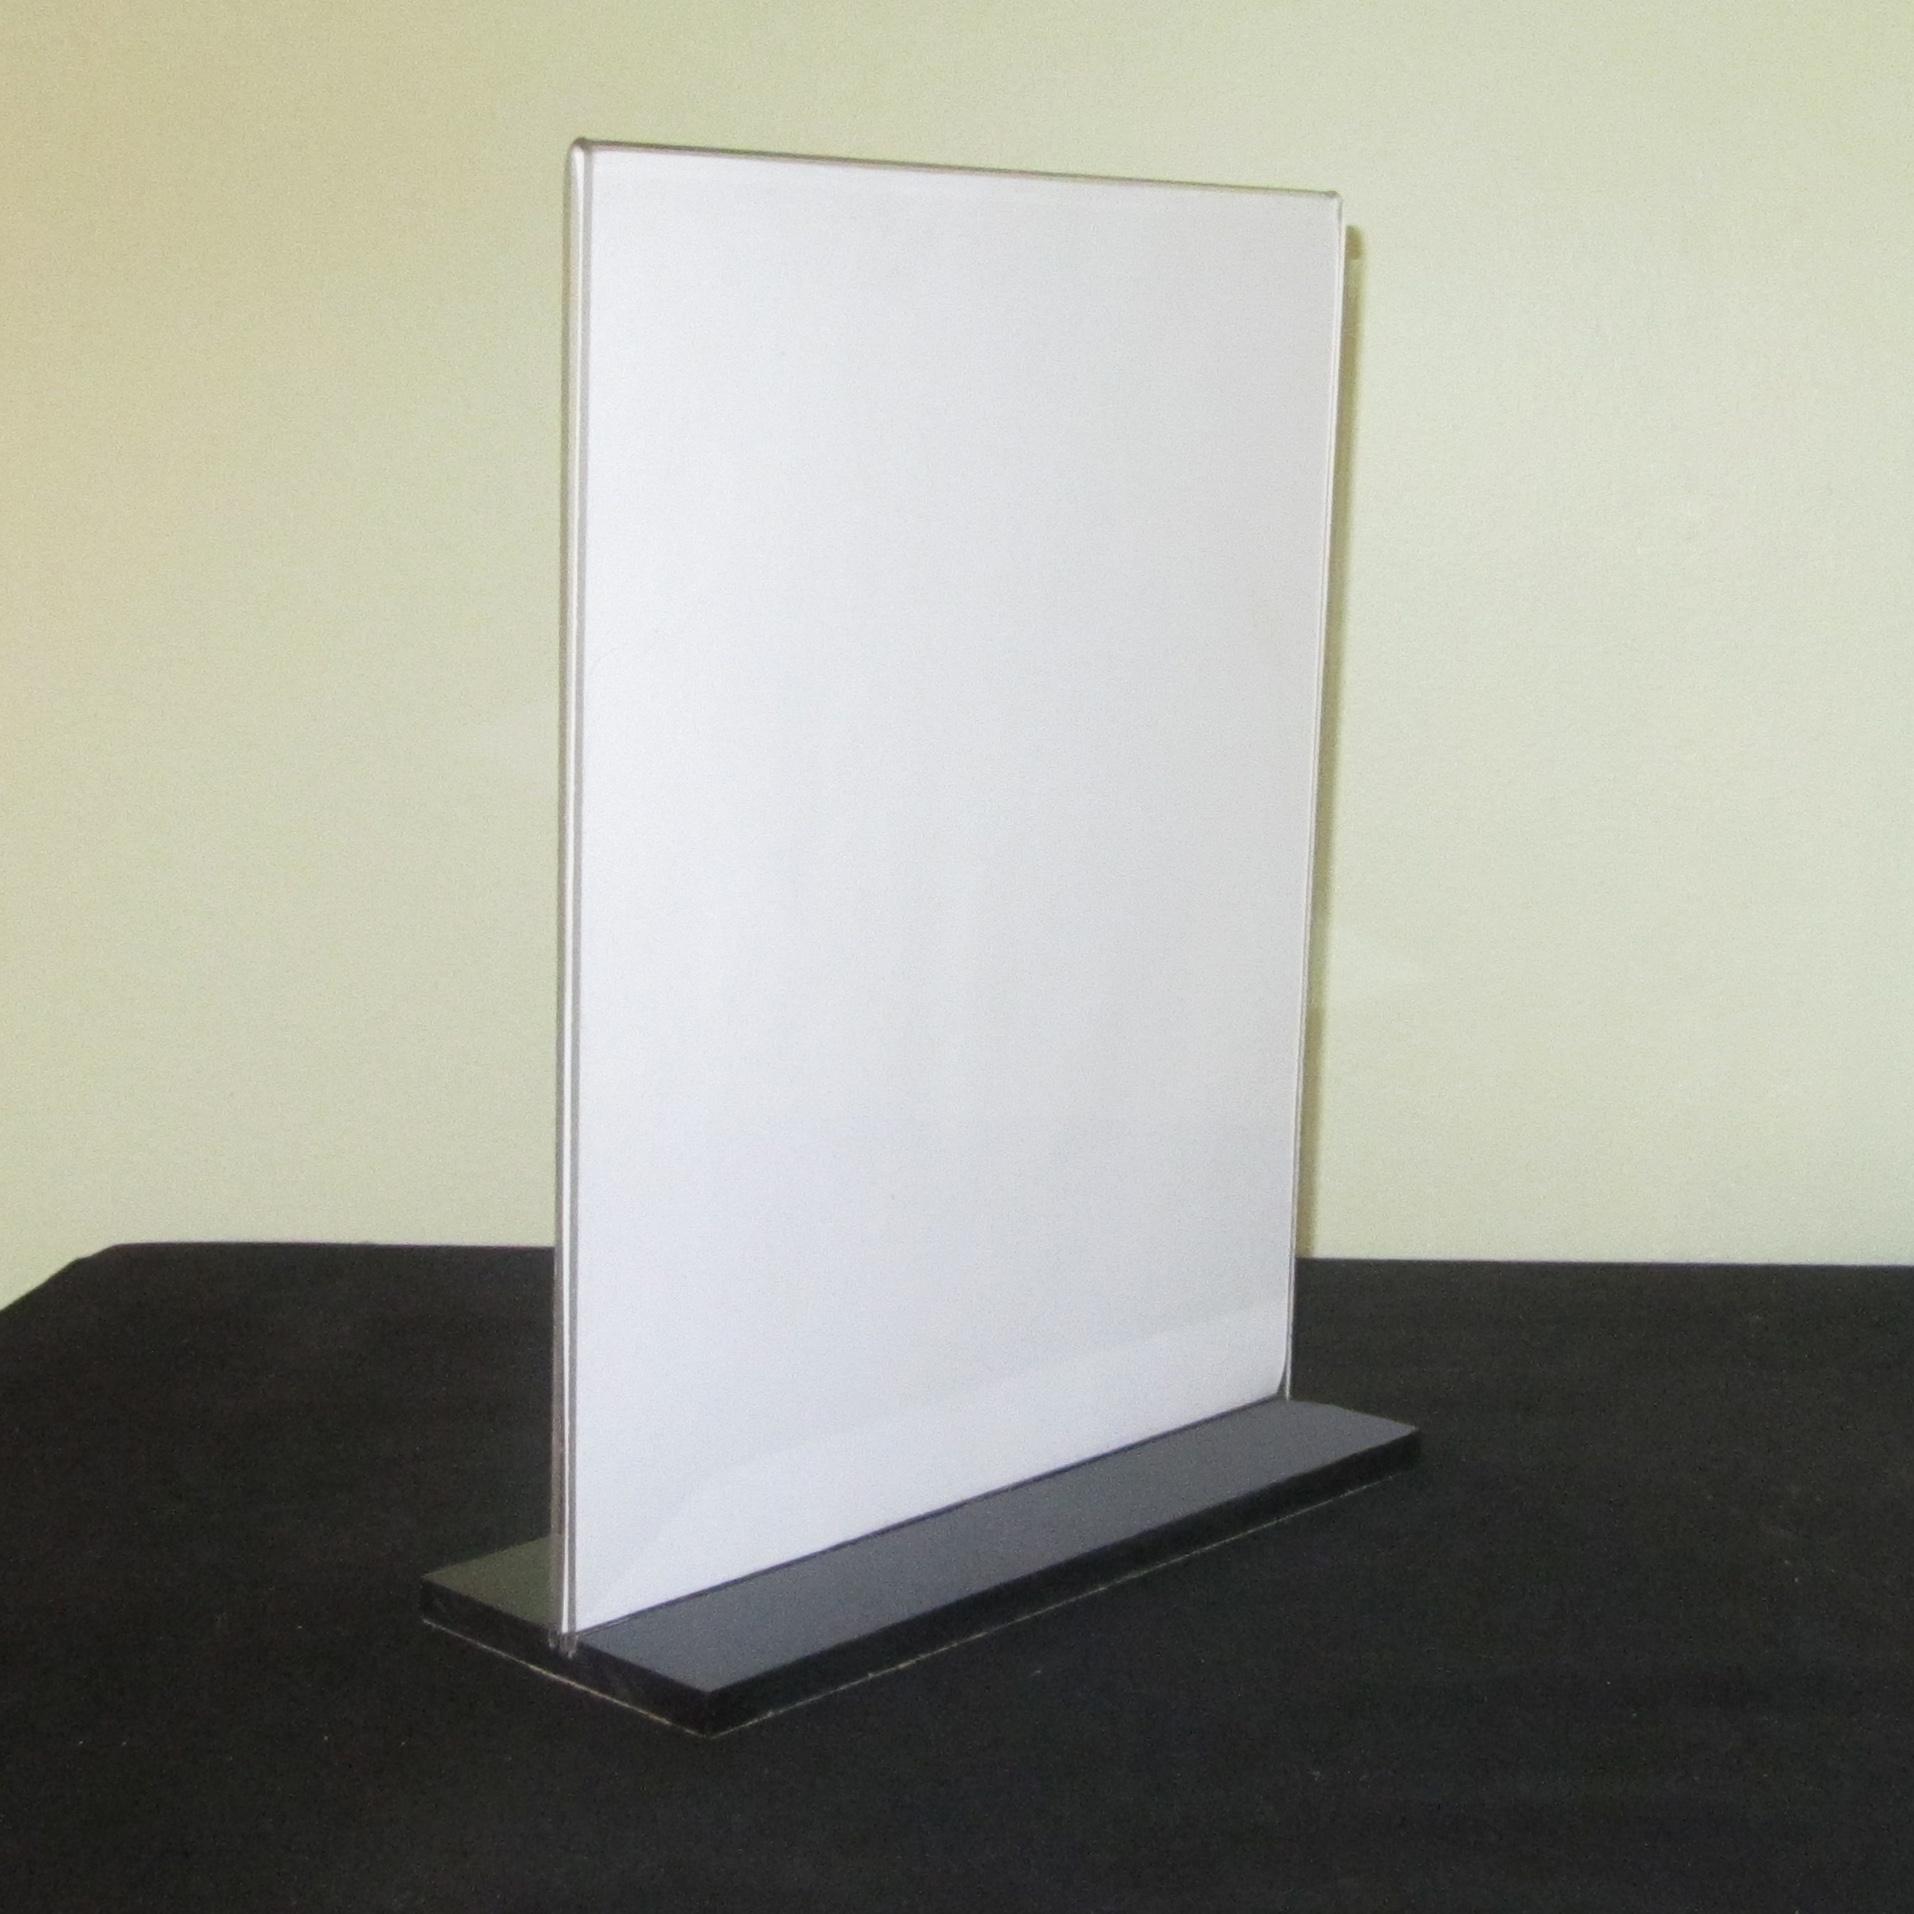 plexi frames, acrylic t base sigh holder, literature display, phot ...